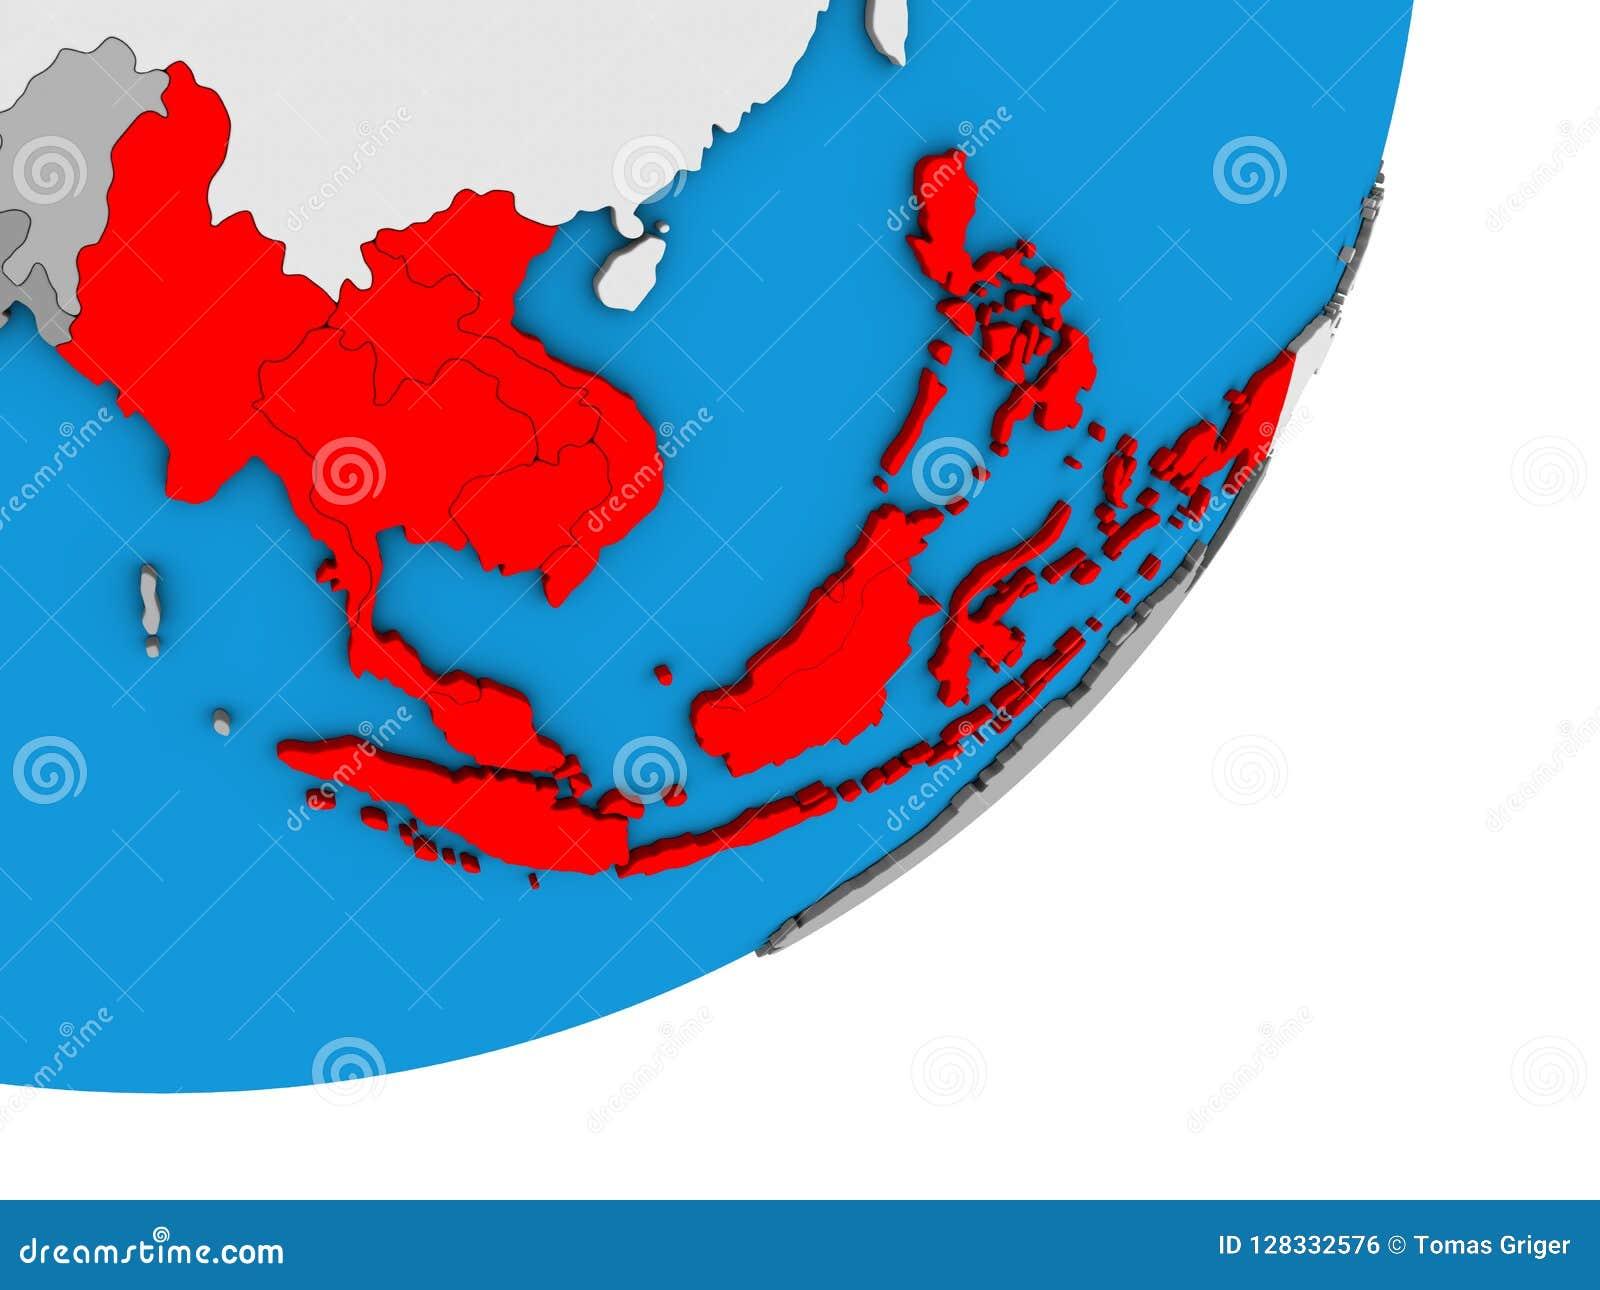 Map Of South East Asia On 3D Globe Stock Illustration - Illustration ...